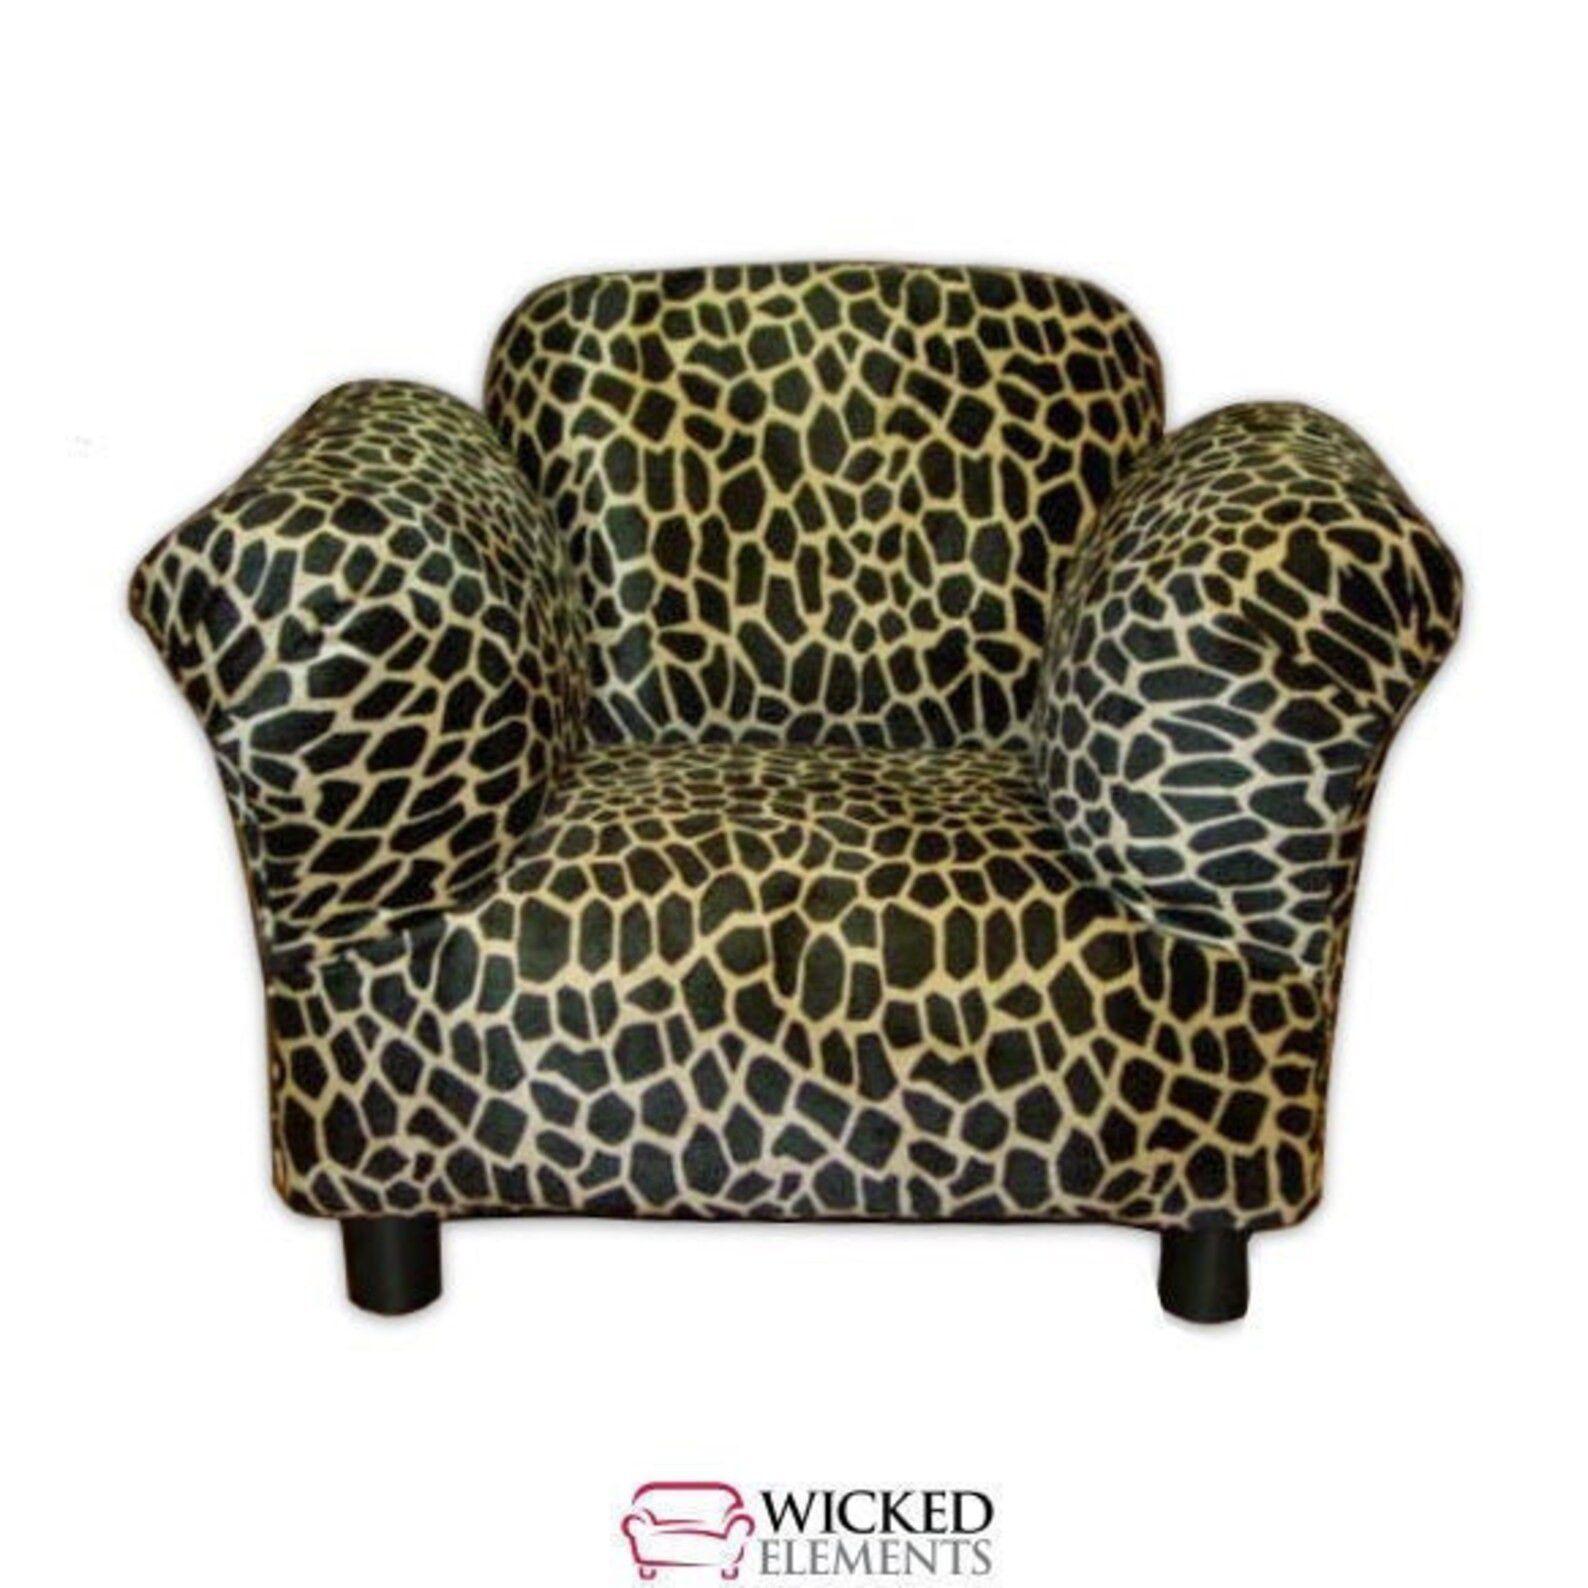 giraffe print kid-sized armchair